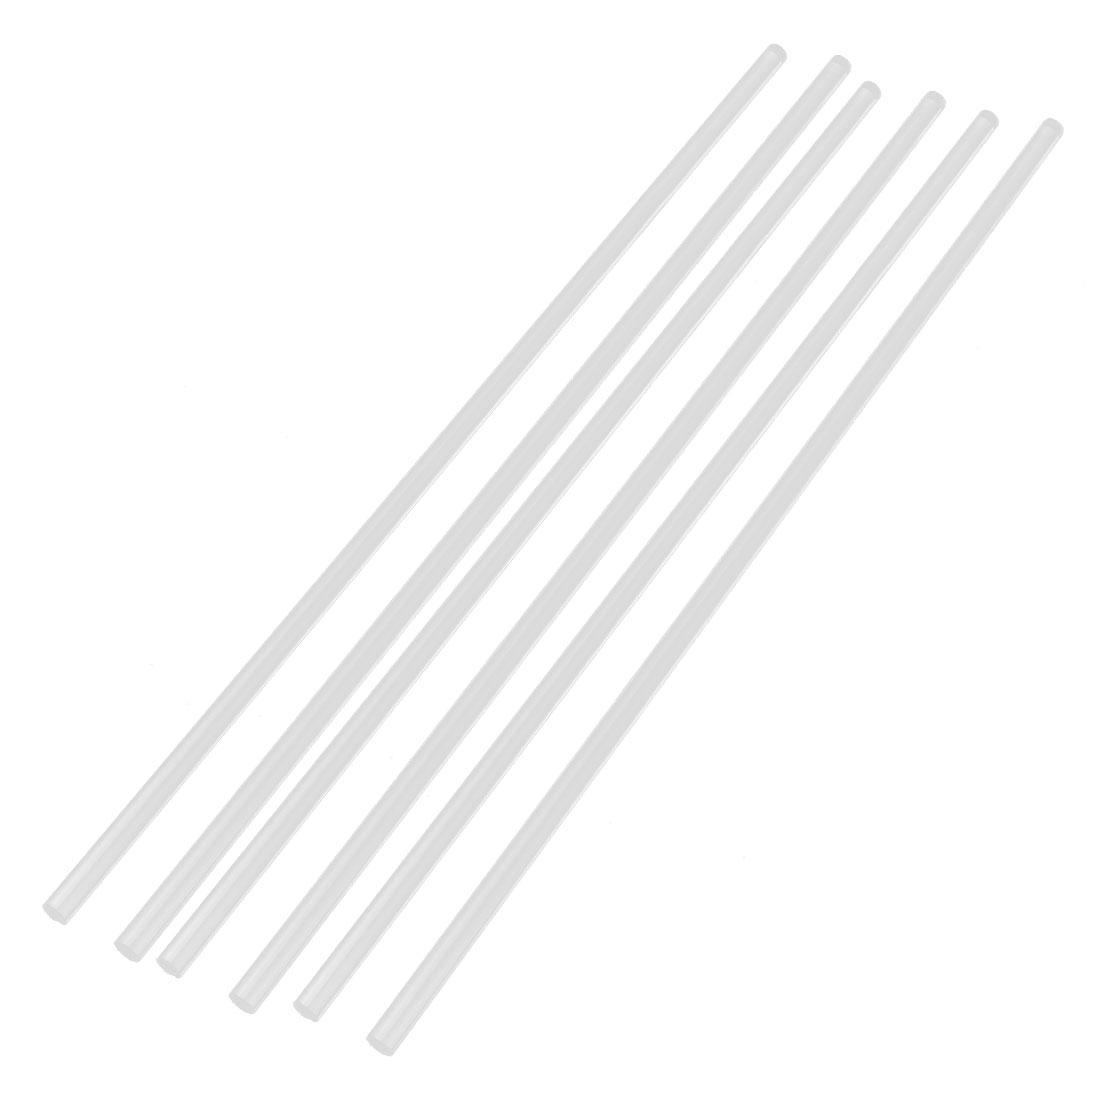 "6Pcs 6mm Dia Clear Round PMMA Extruded Acrylic Rod Bar 12"" Length"